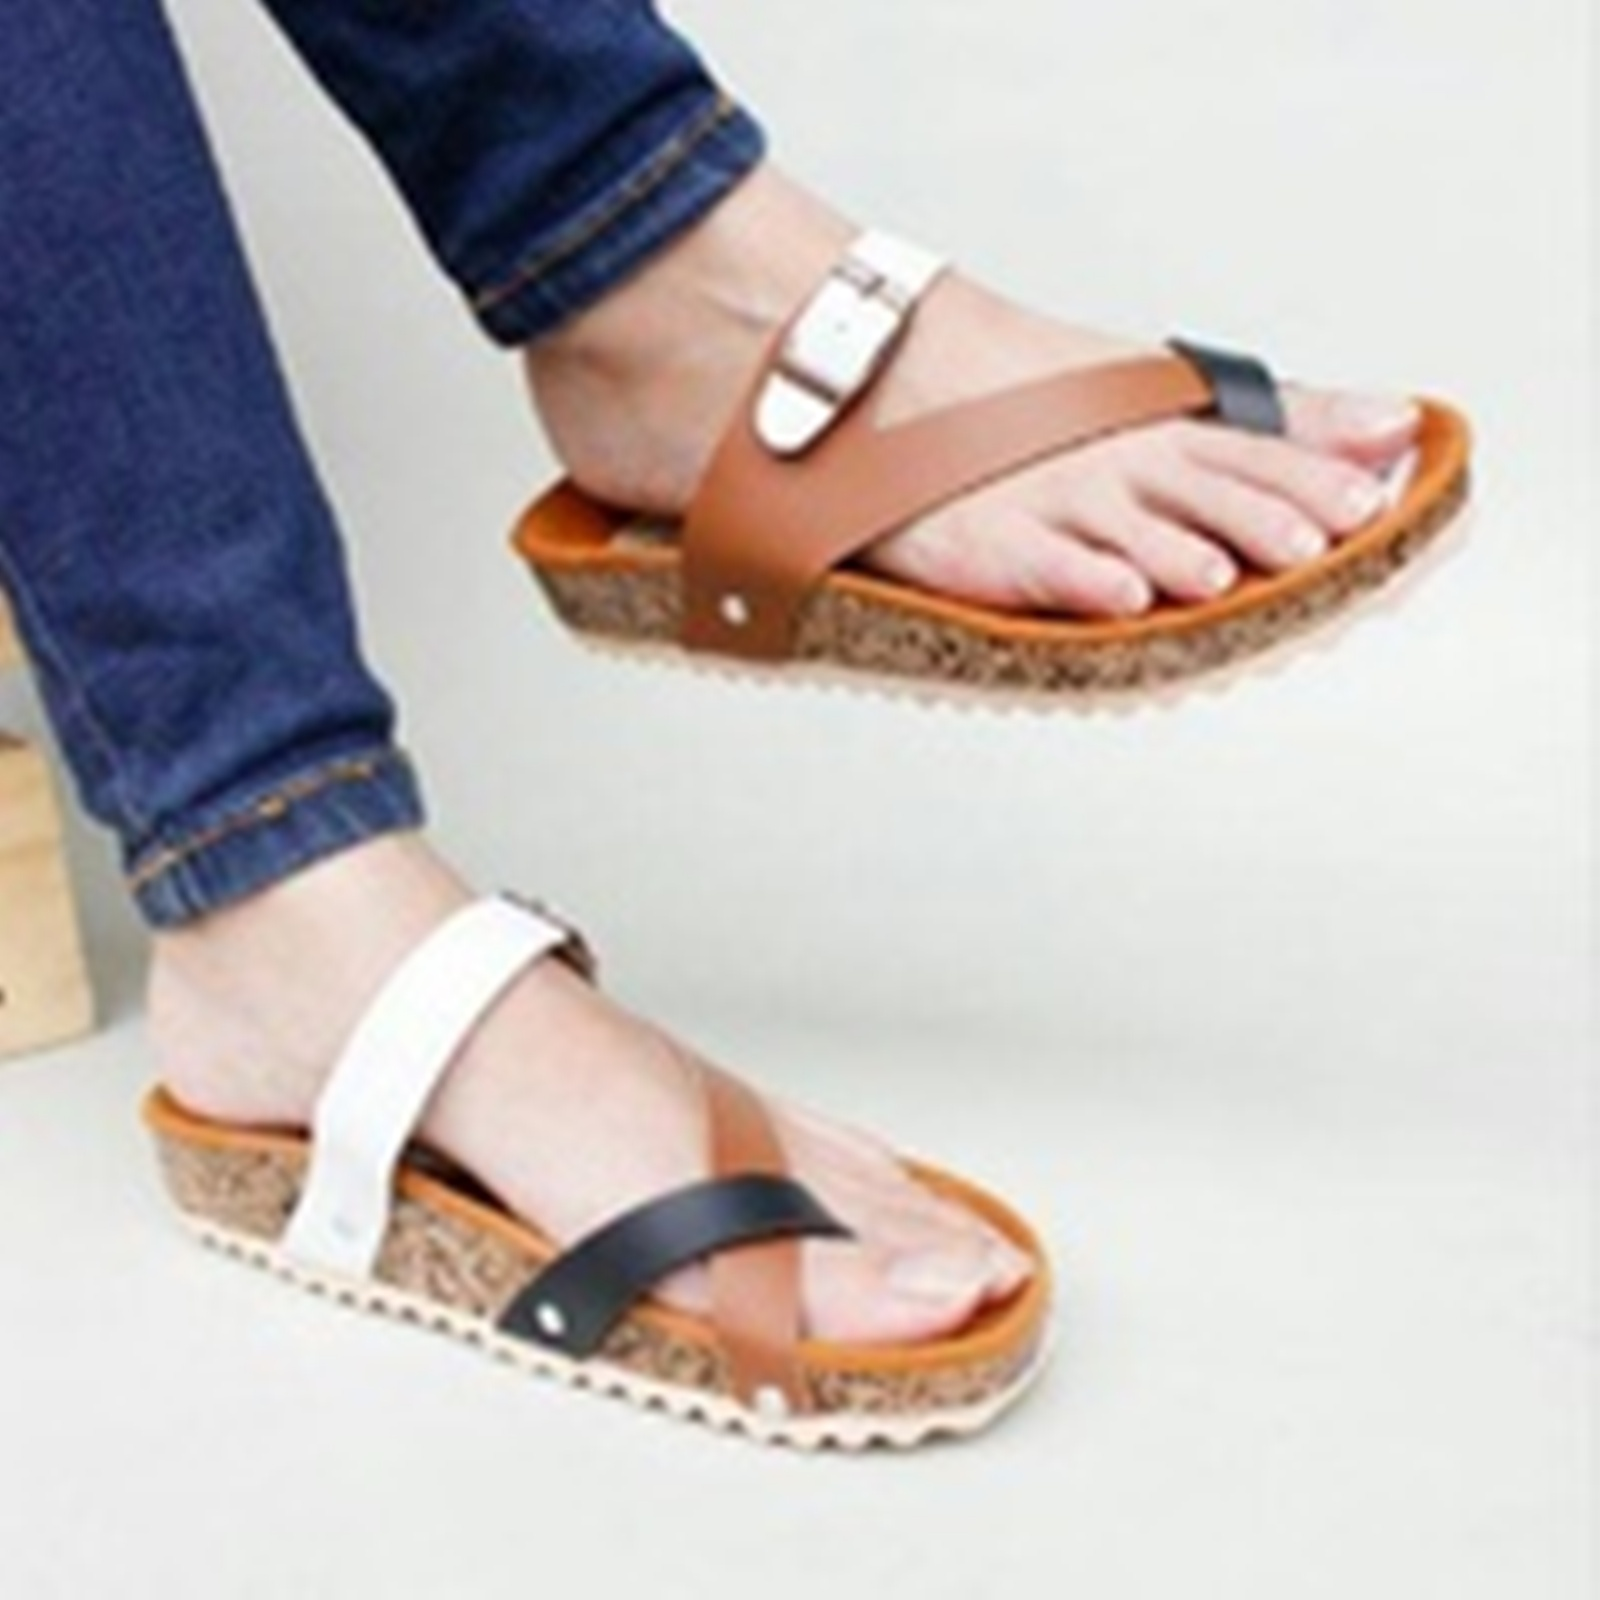 Jual Sandal Sendal Wanita Model Carvil Gesper Silang Coklat